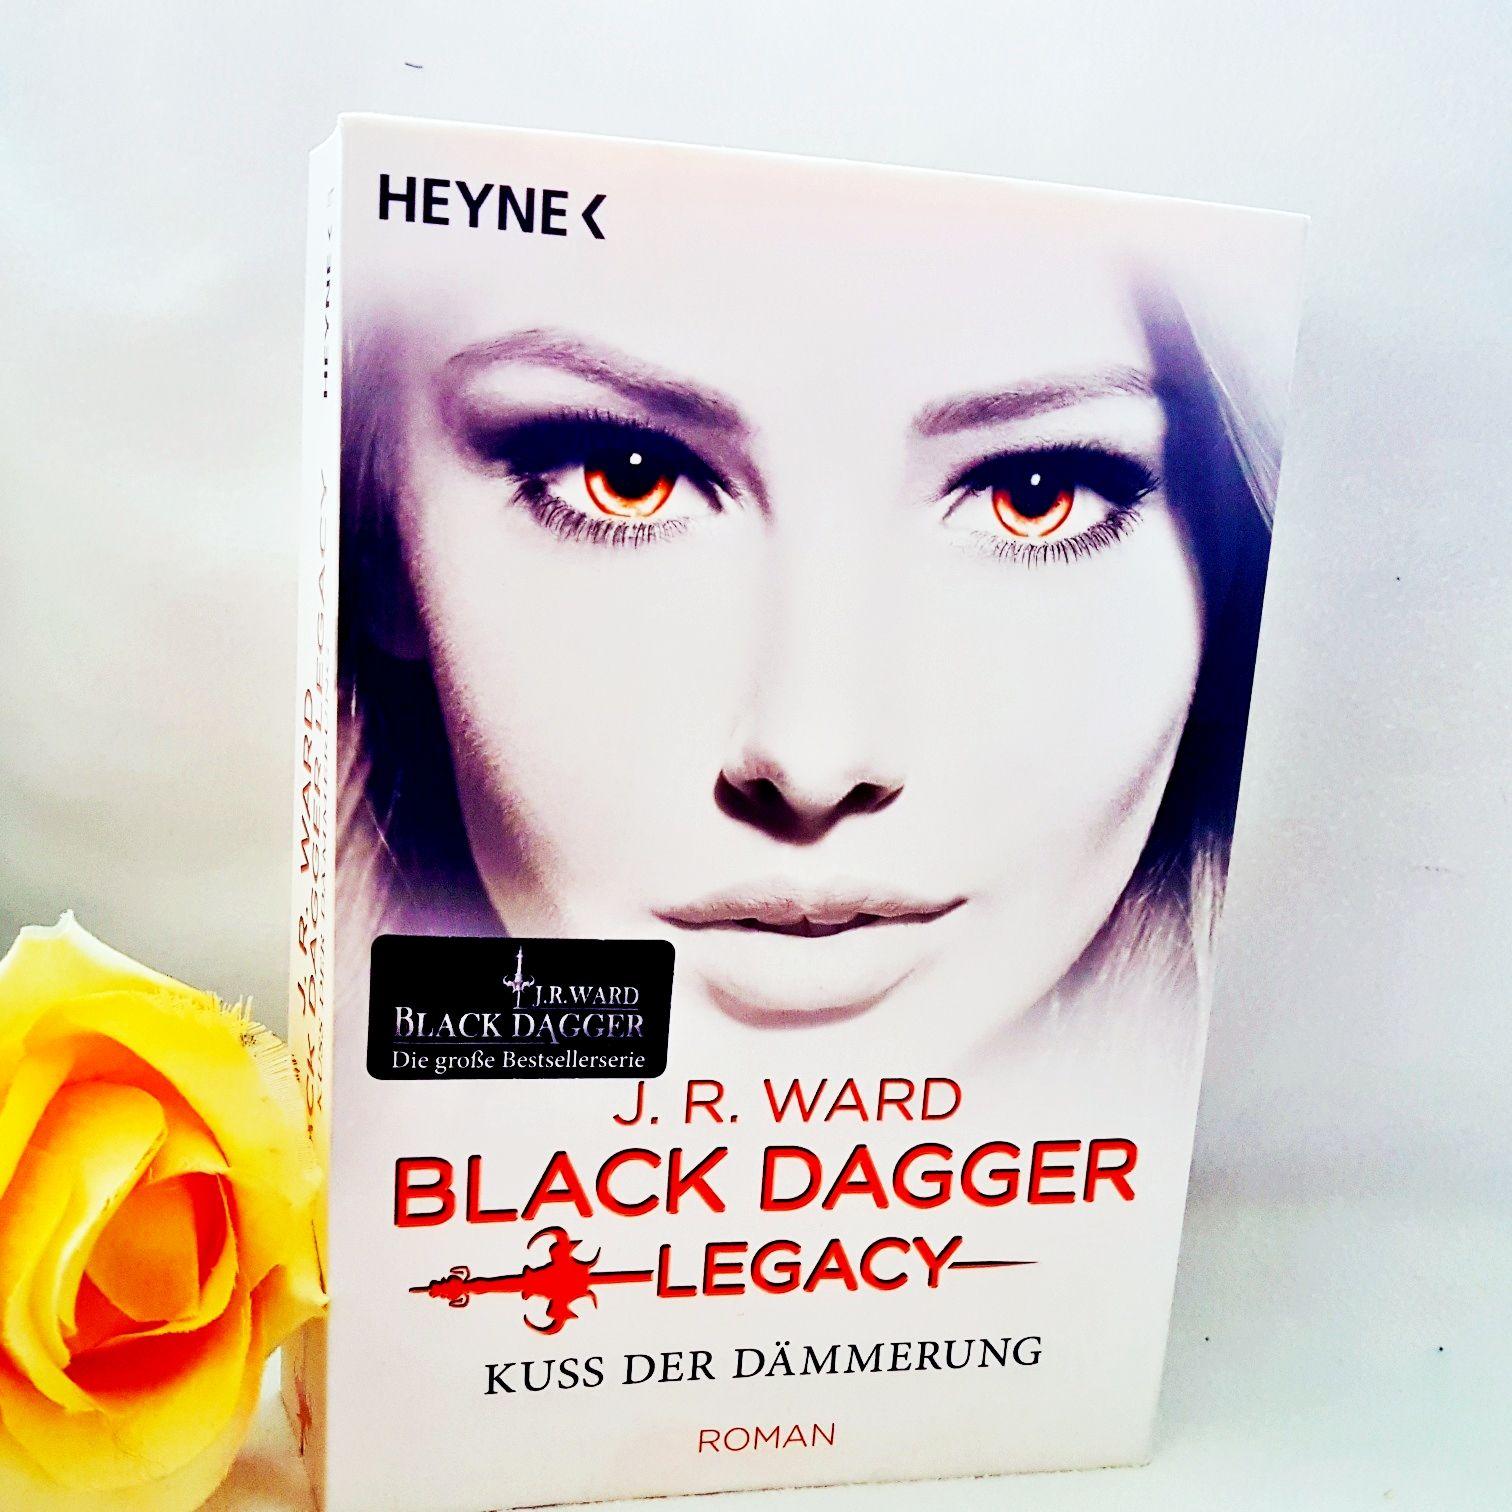 Black Dagger Legacy von J.R.Ward